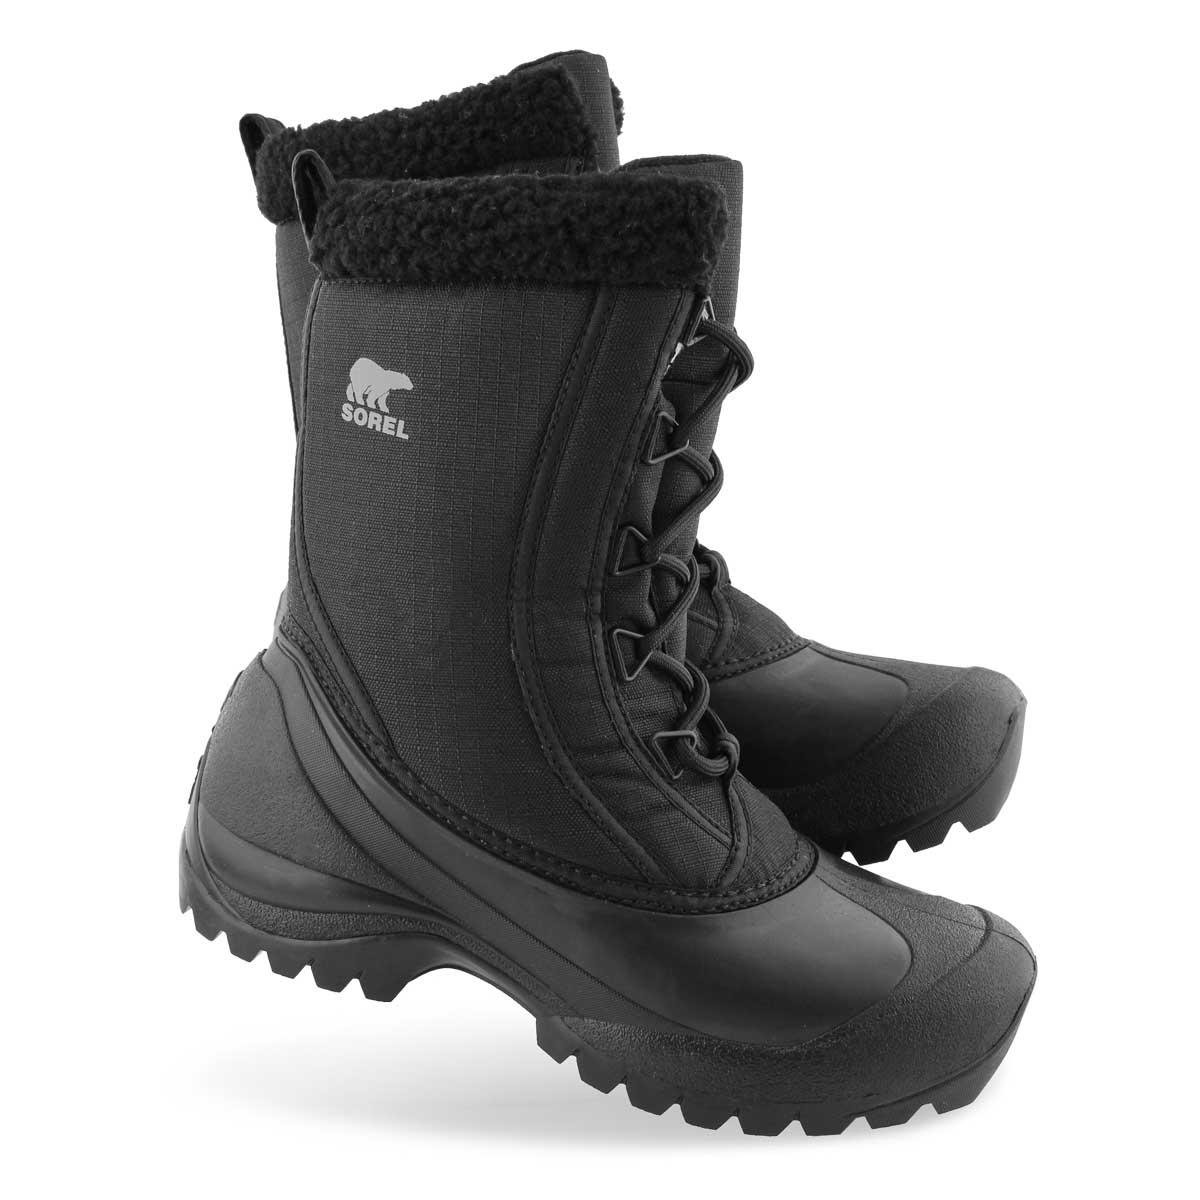 Lds Cumberland DTV blk wtpf winter boot